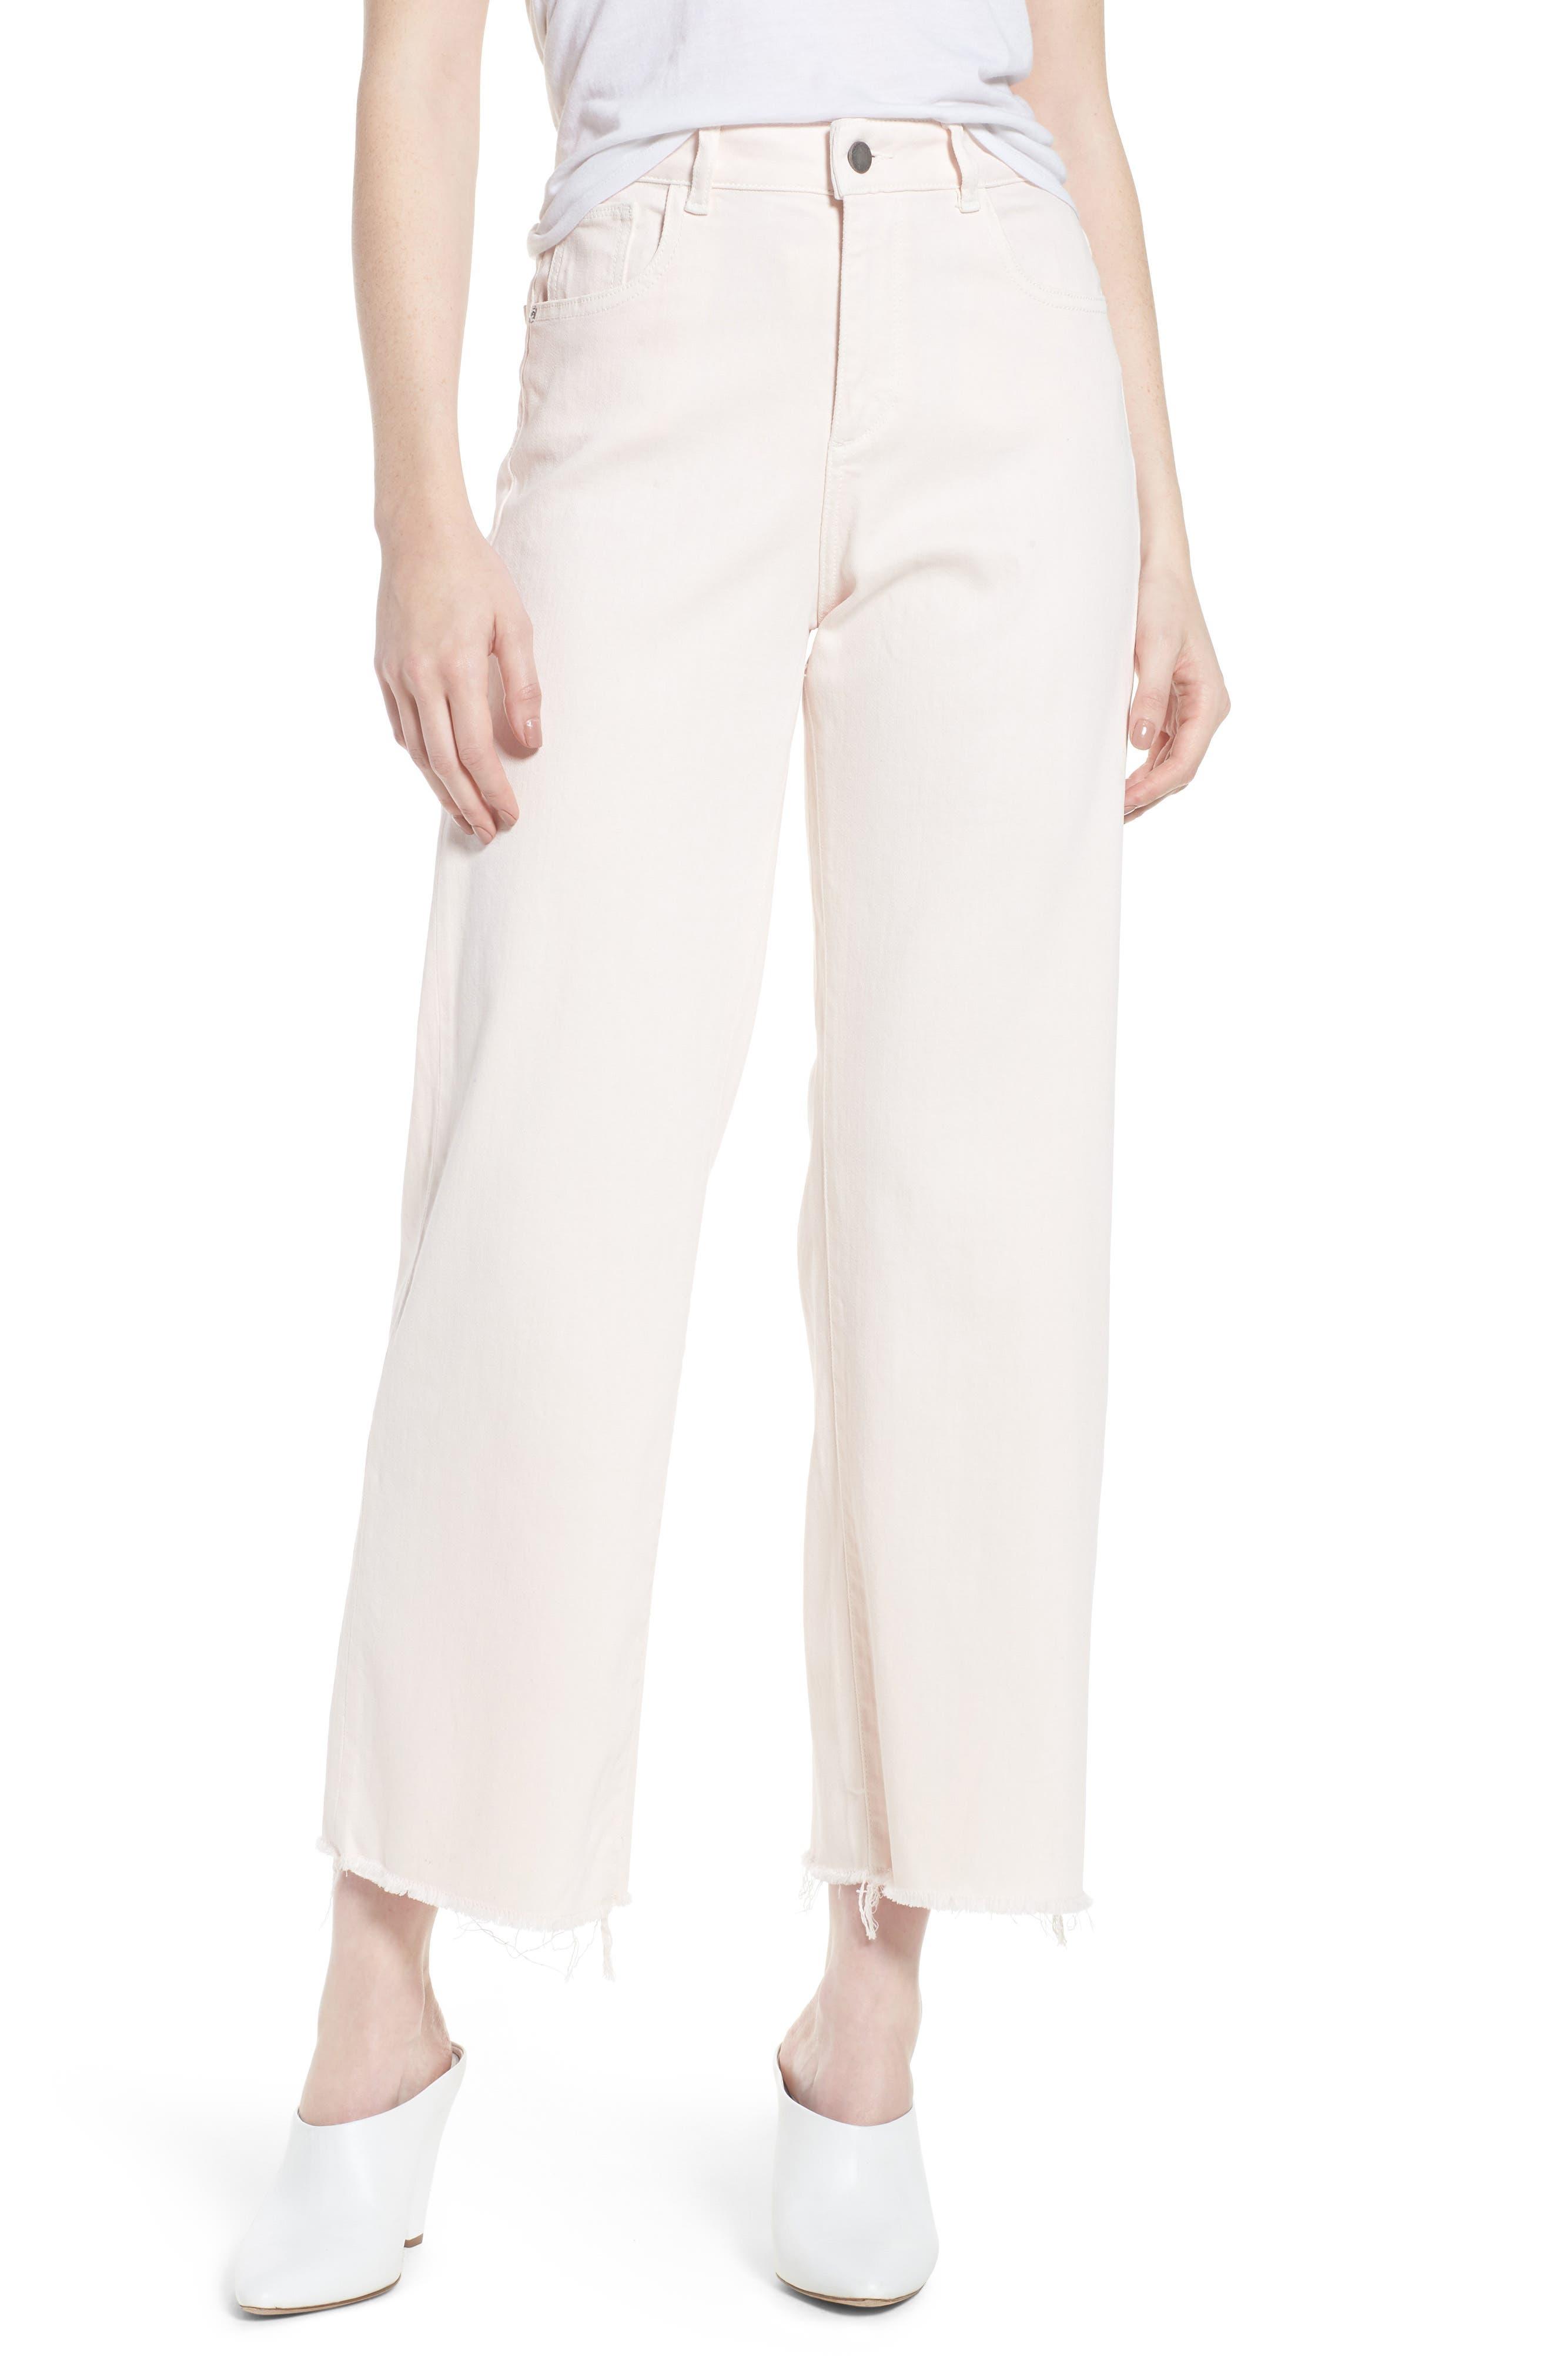 Hepburn Ankle Wide Leg Jeans,                         Main,                         color, Blush Pink